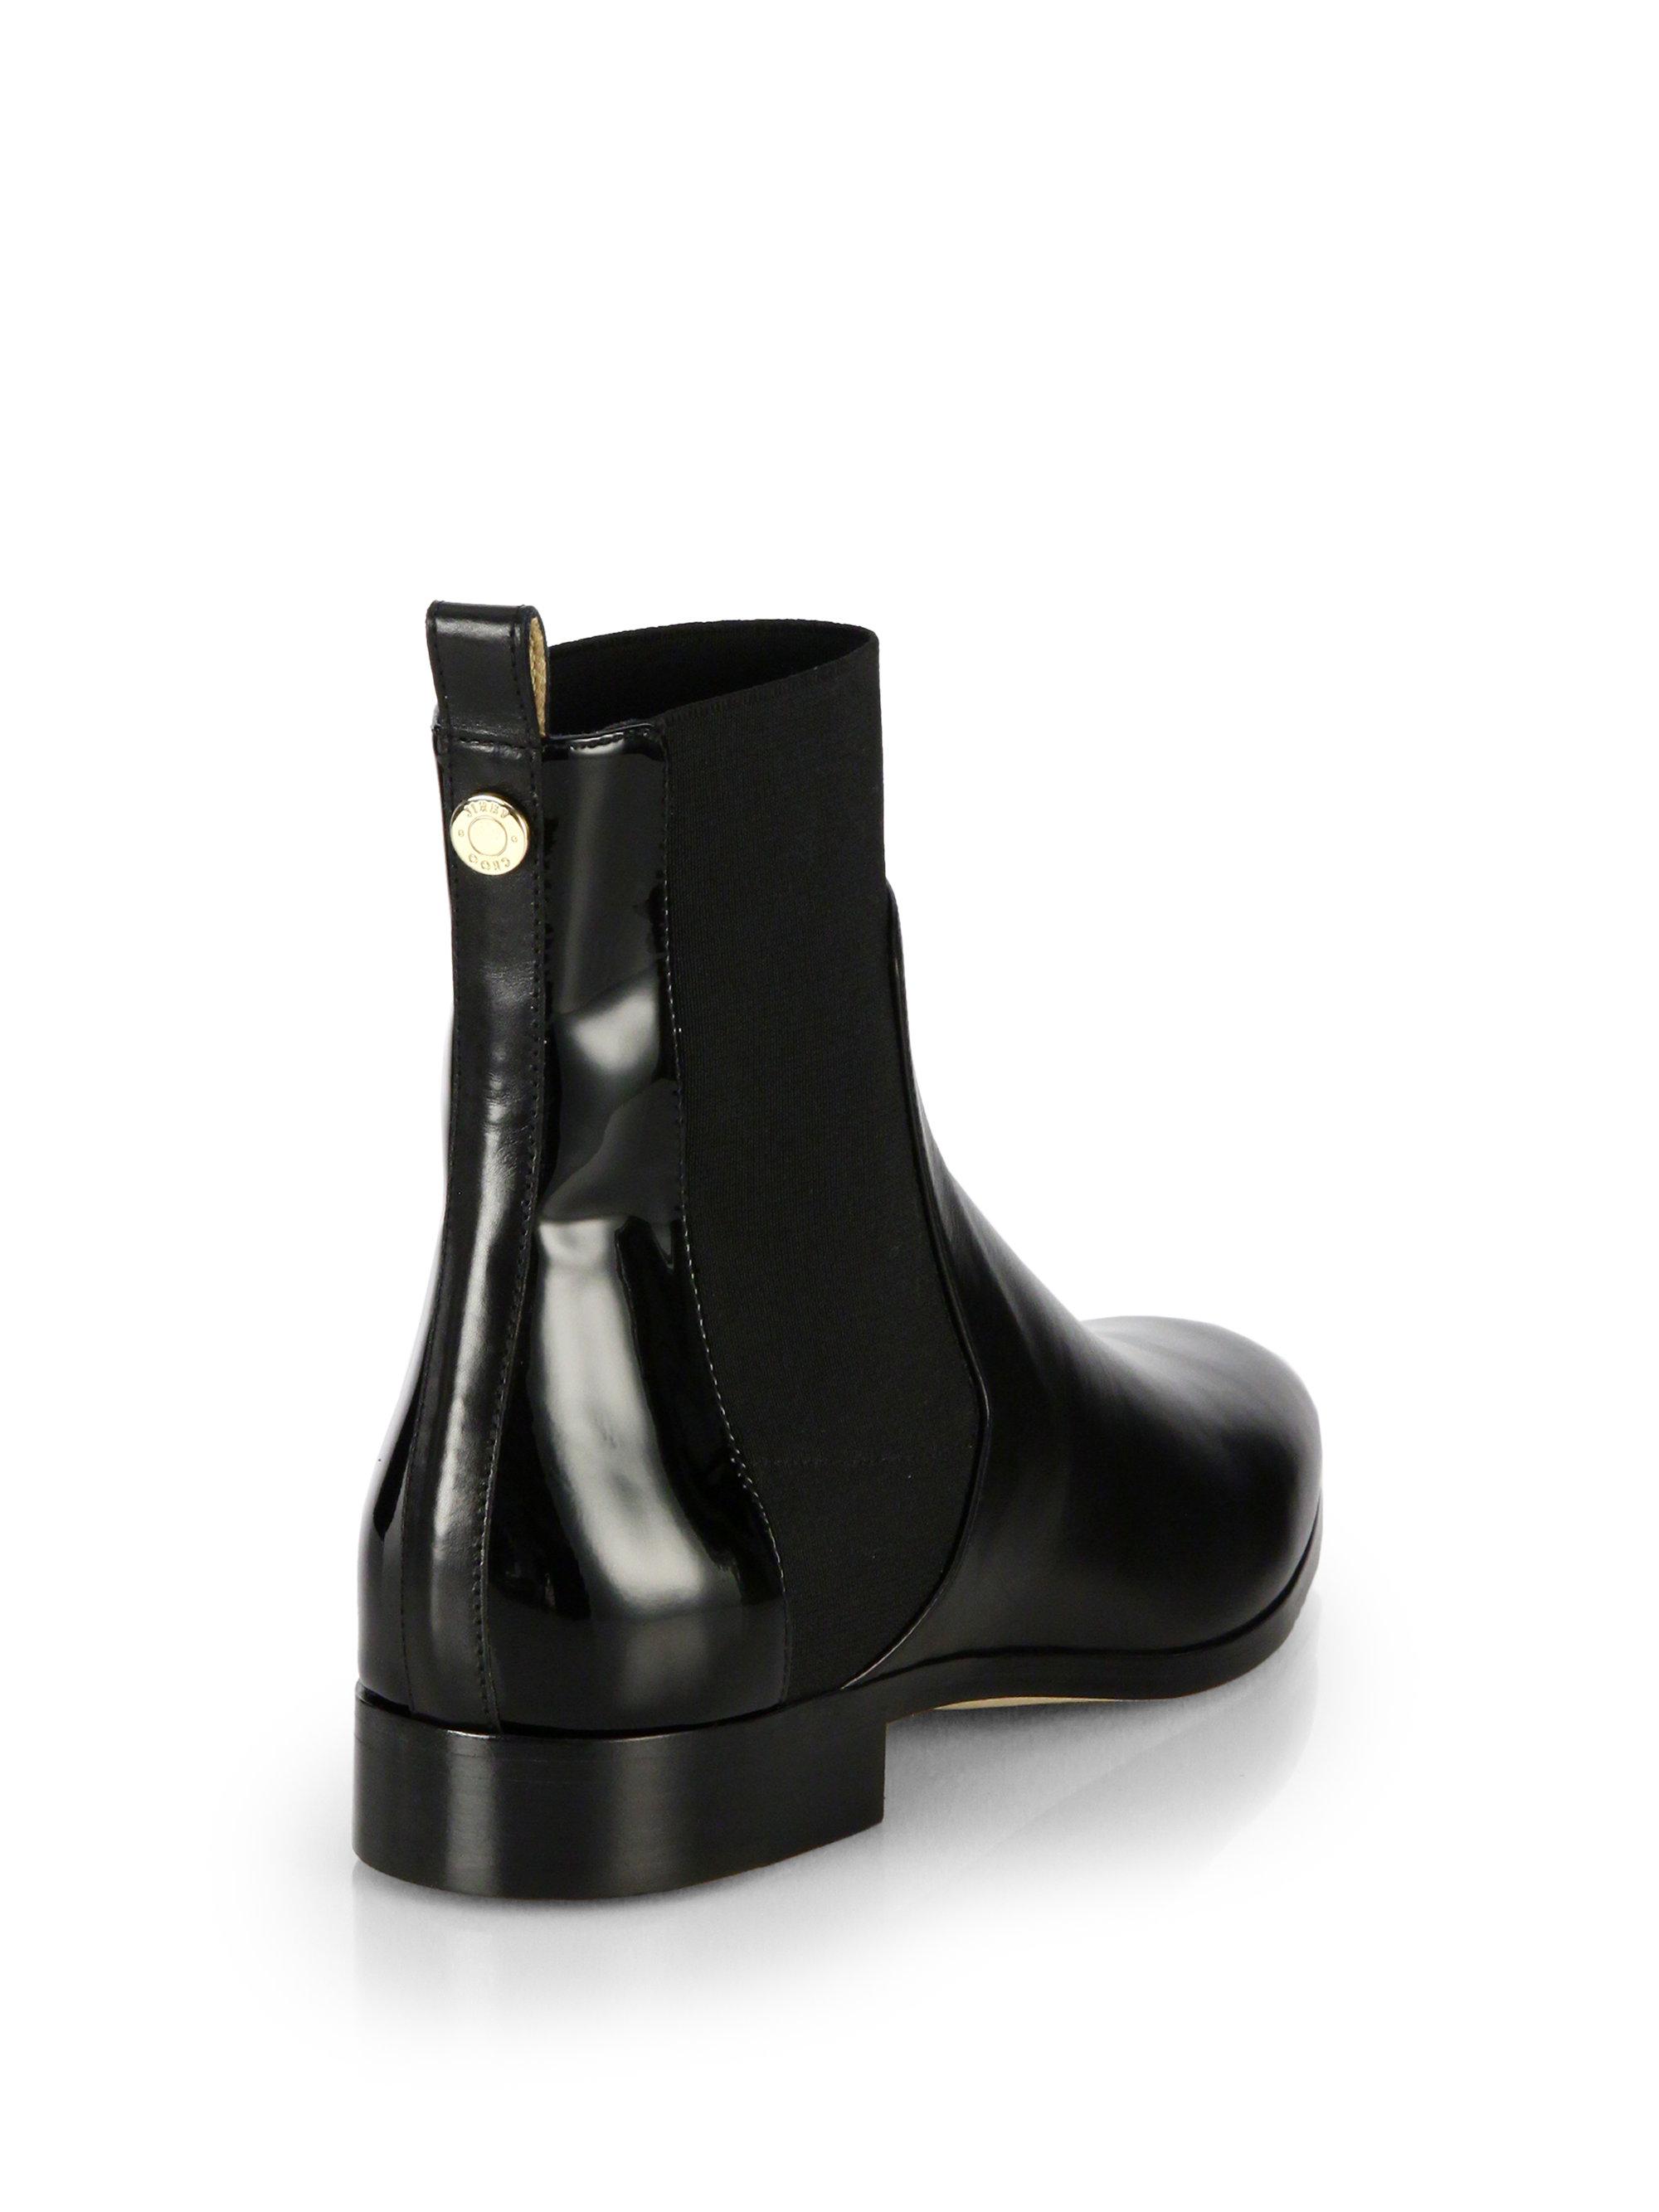 amazon online sale cheap Jimmy Choo Hanah Flat leather ankle boots 2014 cheap sale fh36hep9